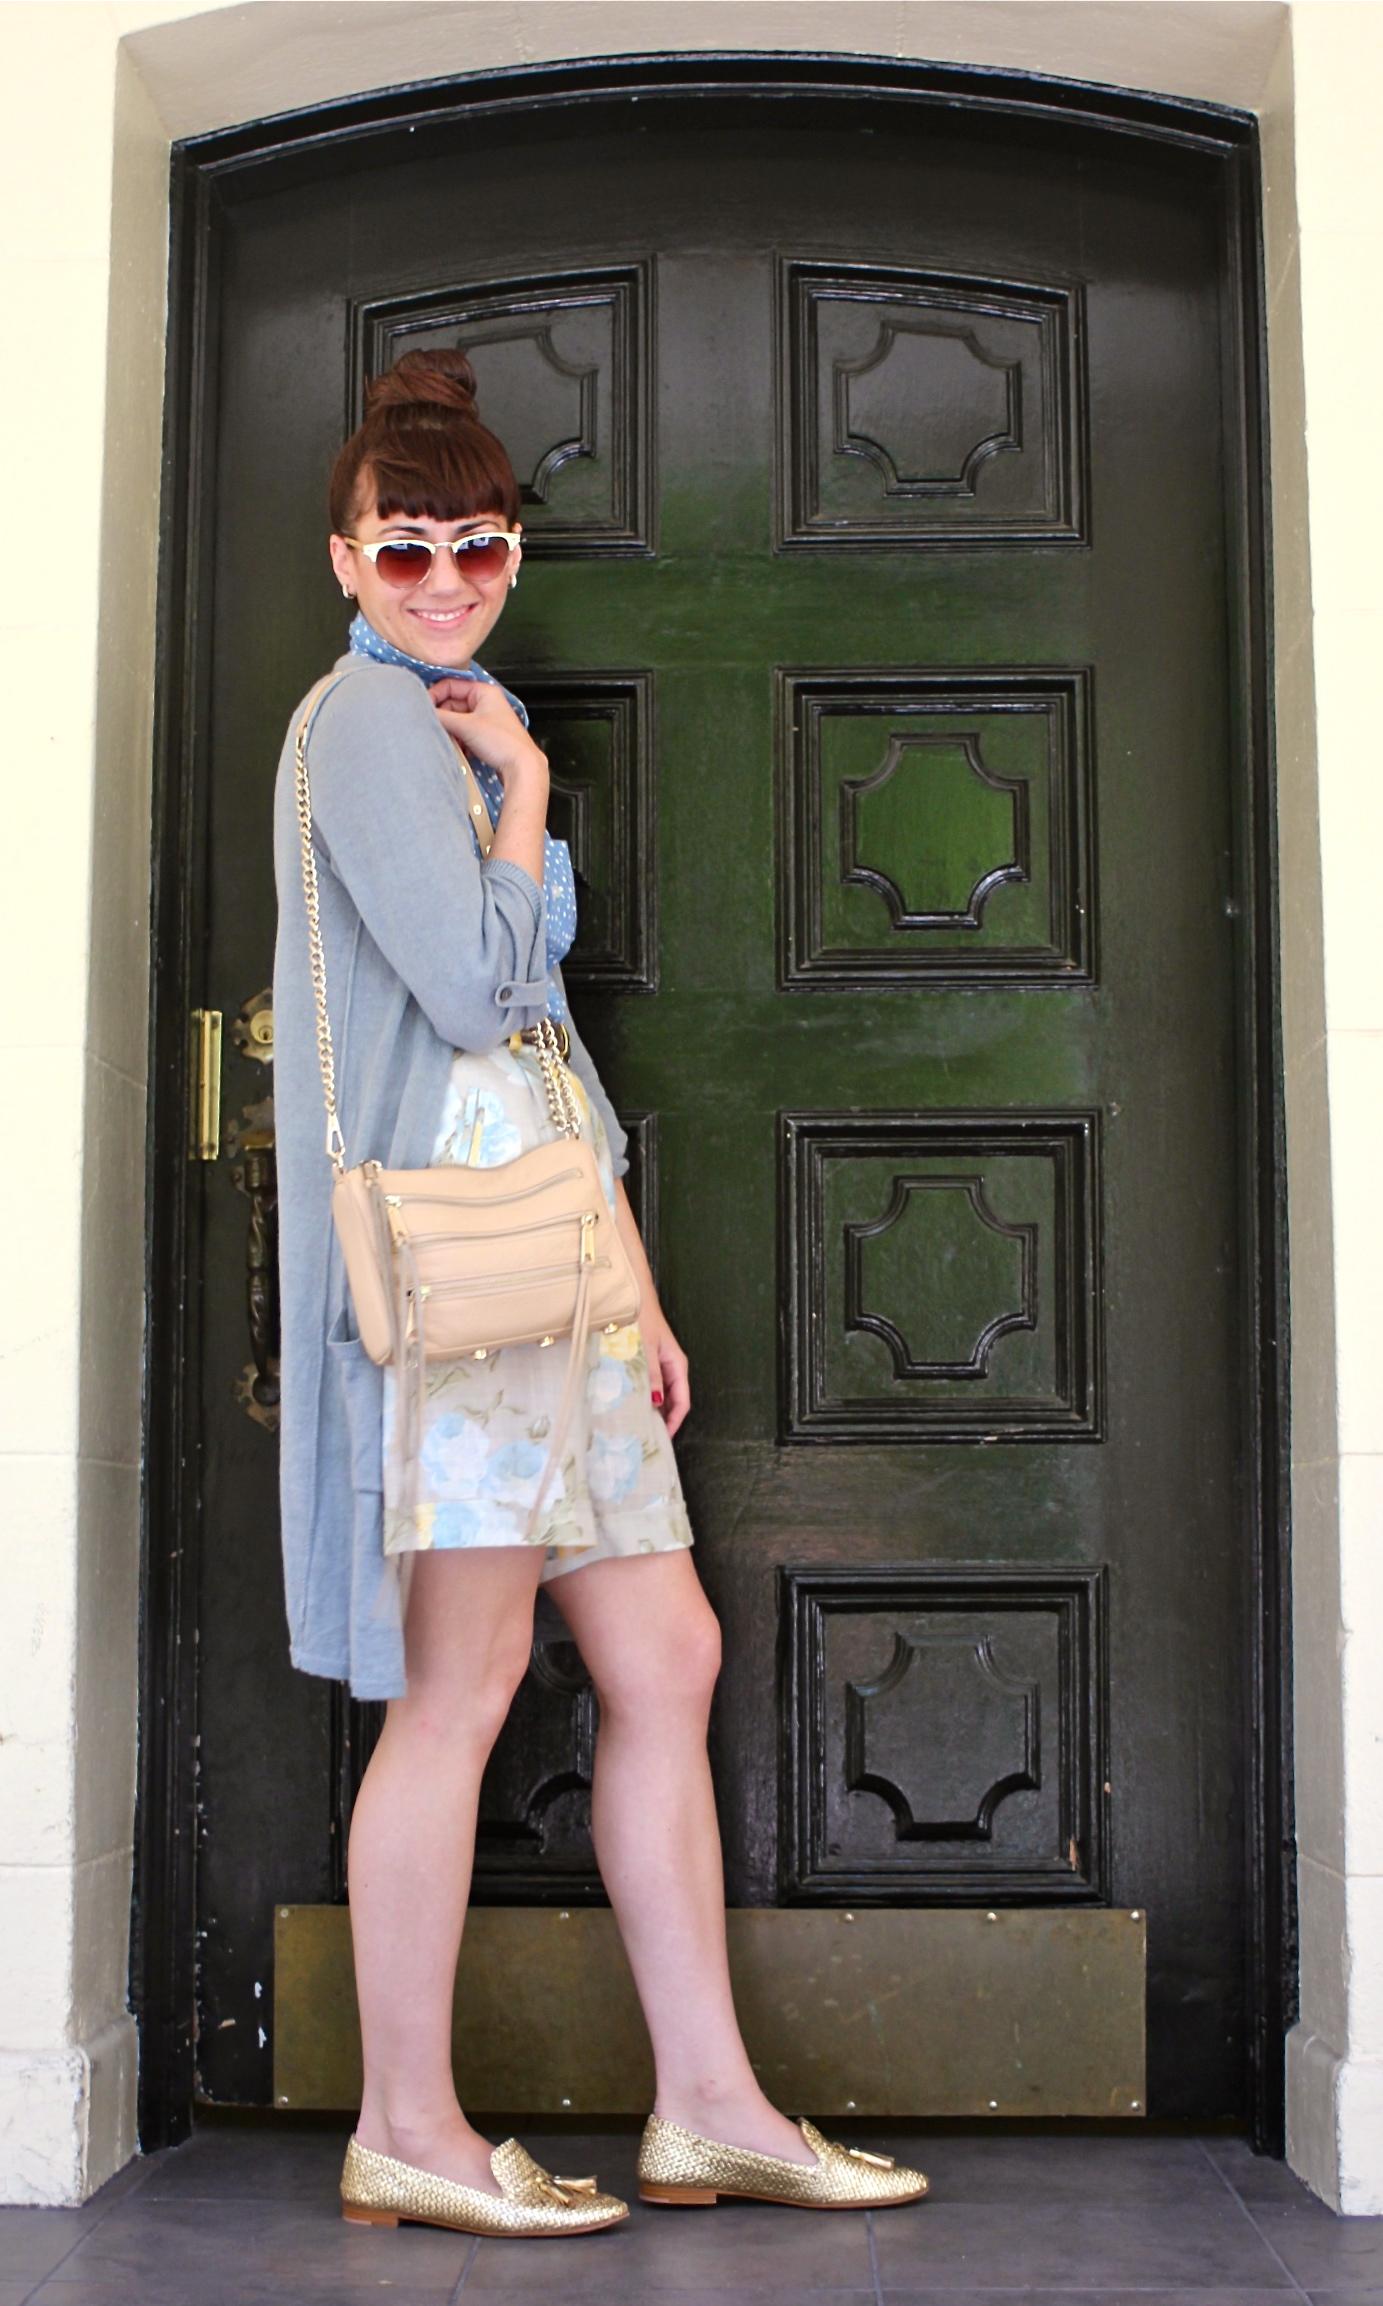 Polka Dot Top: Forever21; Floral Shorts: Vintage, circa 1990s; Linen Tab Sweater: Jigsaw London; Shoes:Prada; Bag: Rebecca Minkoff; Belt: Jaeger